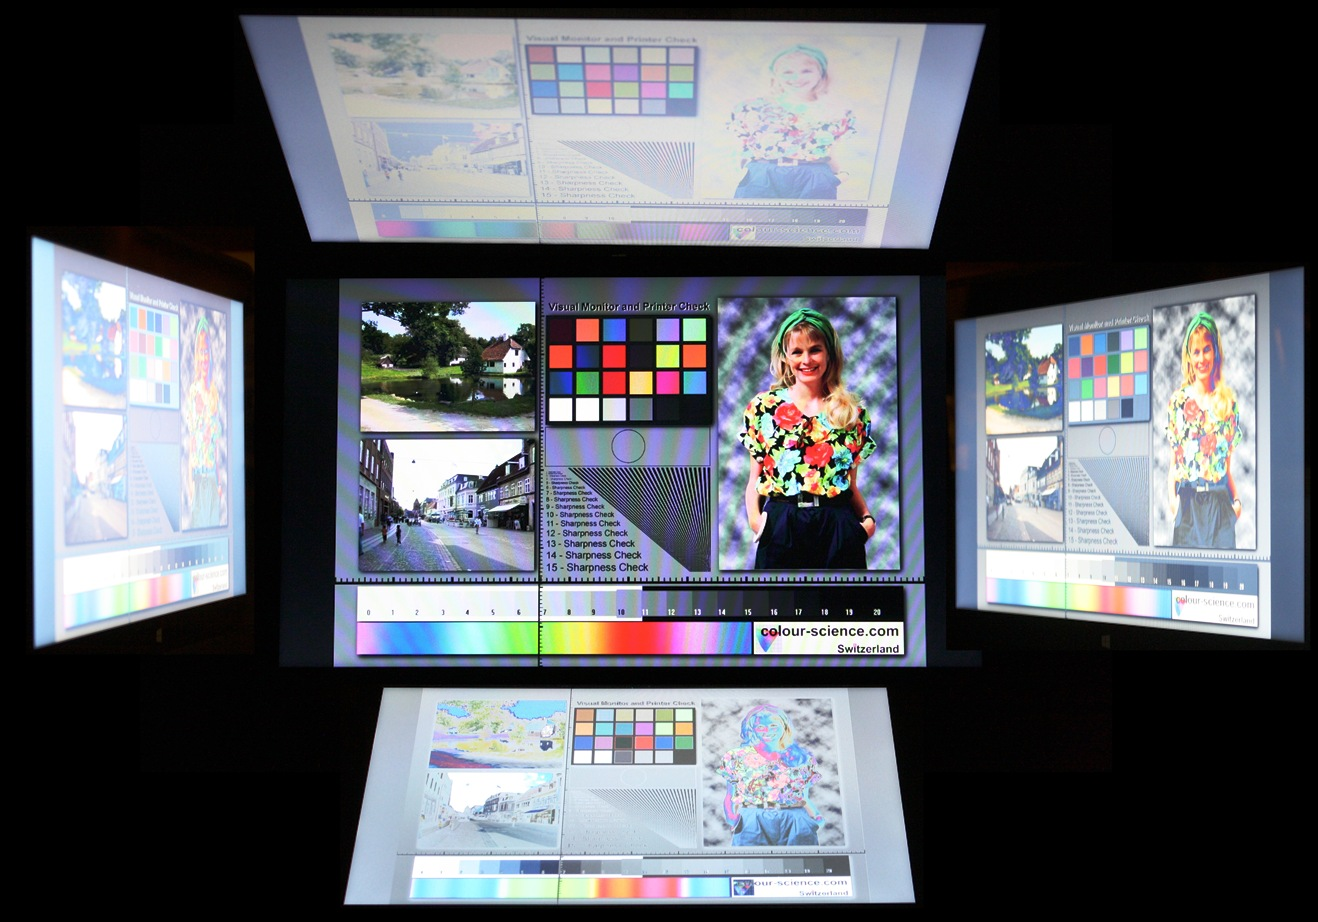 HP Pavilion 11 x360 teszt